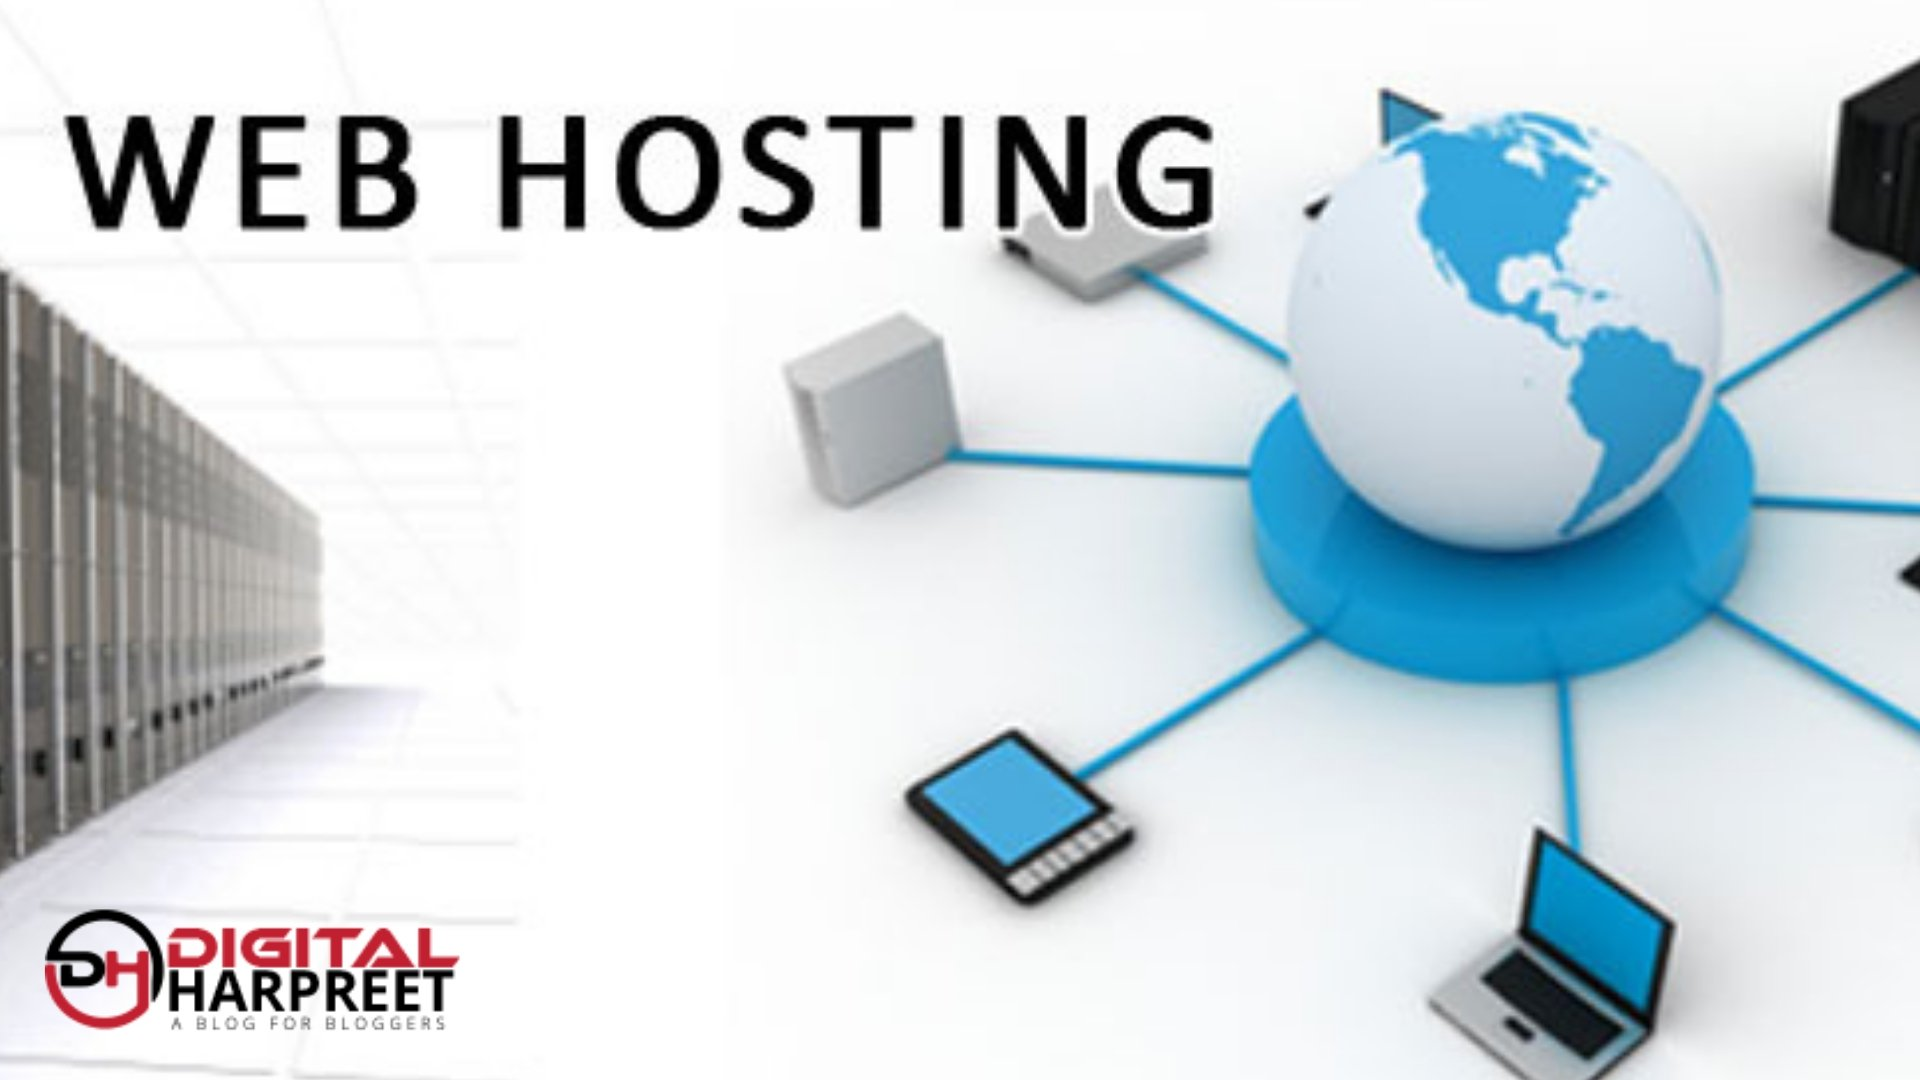 web hosting blog